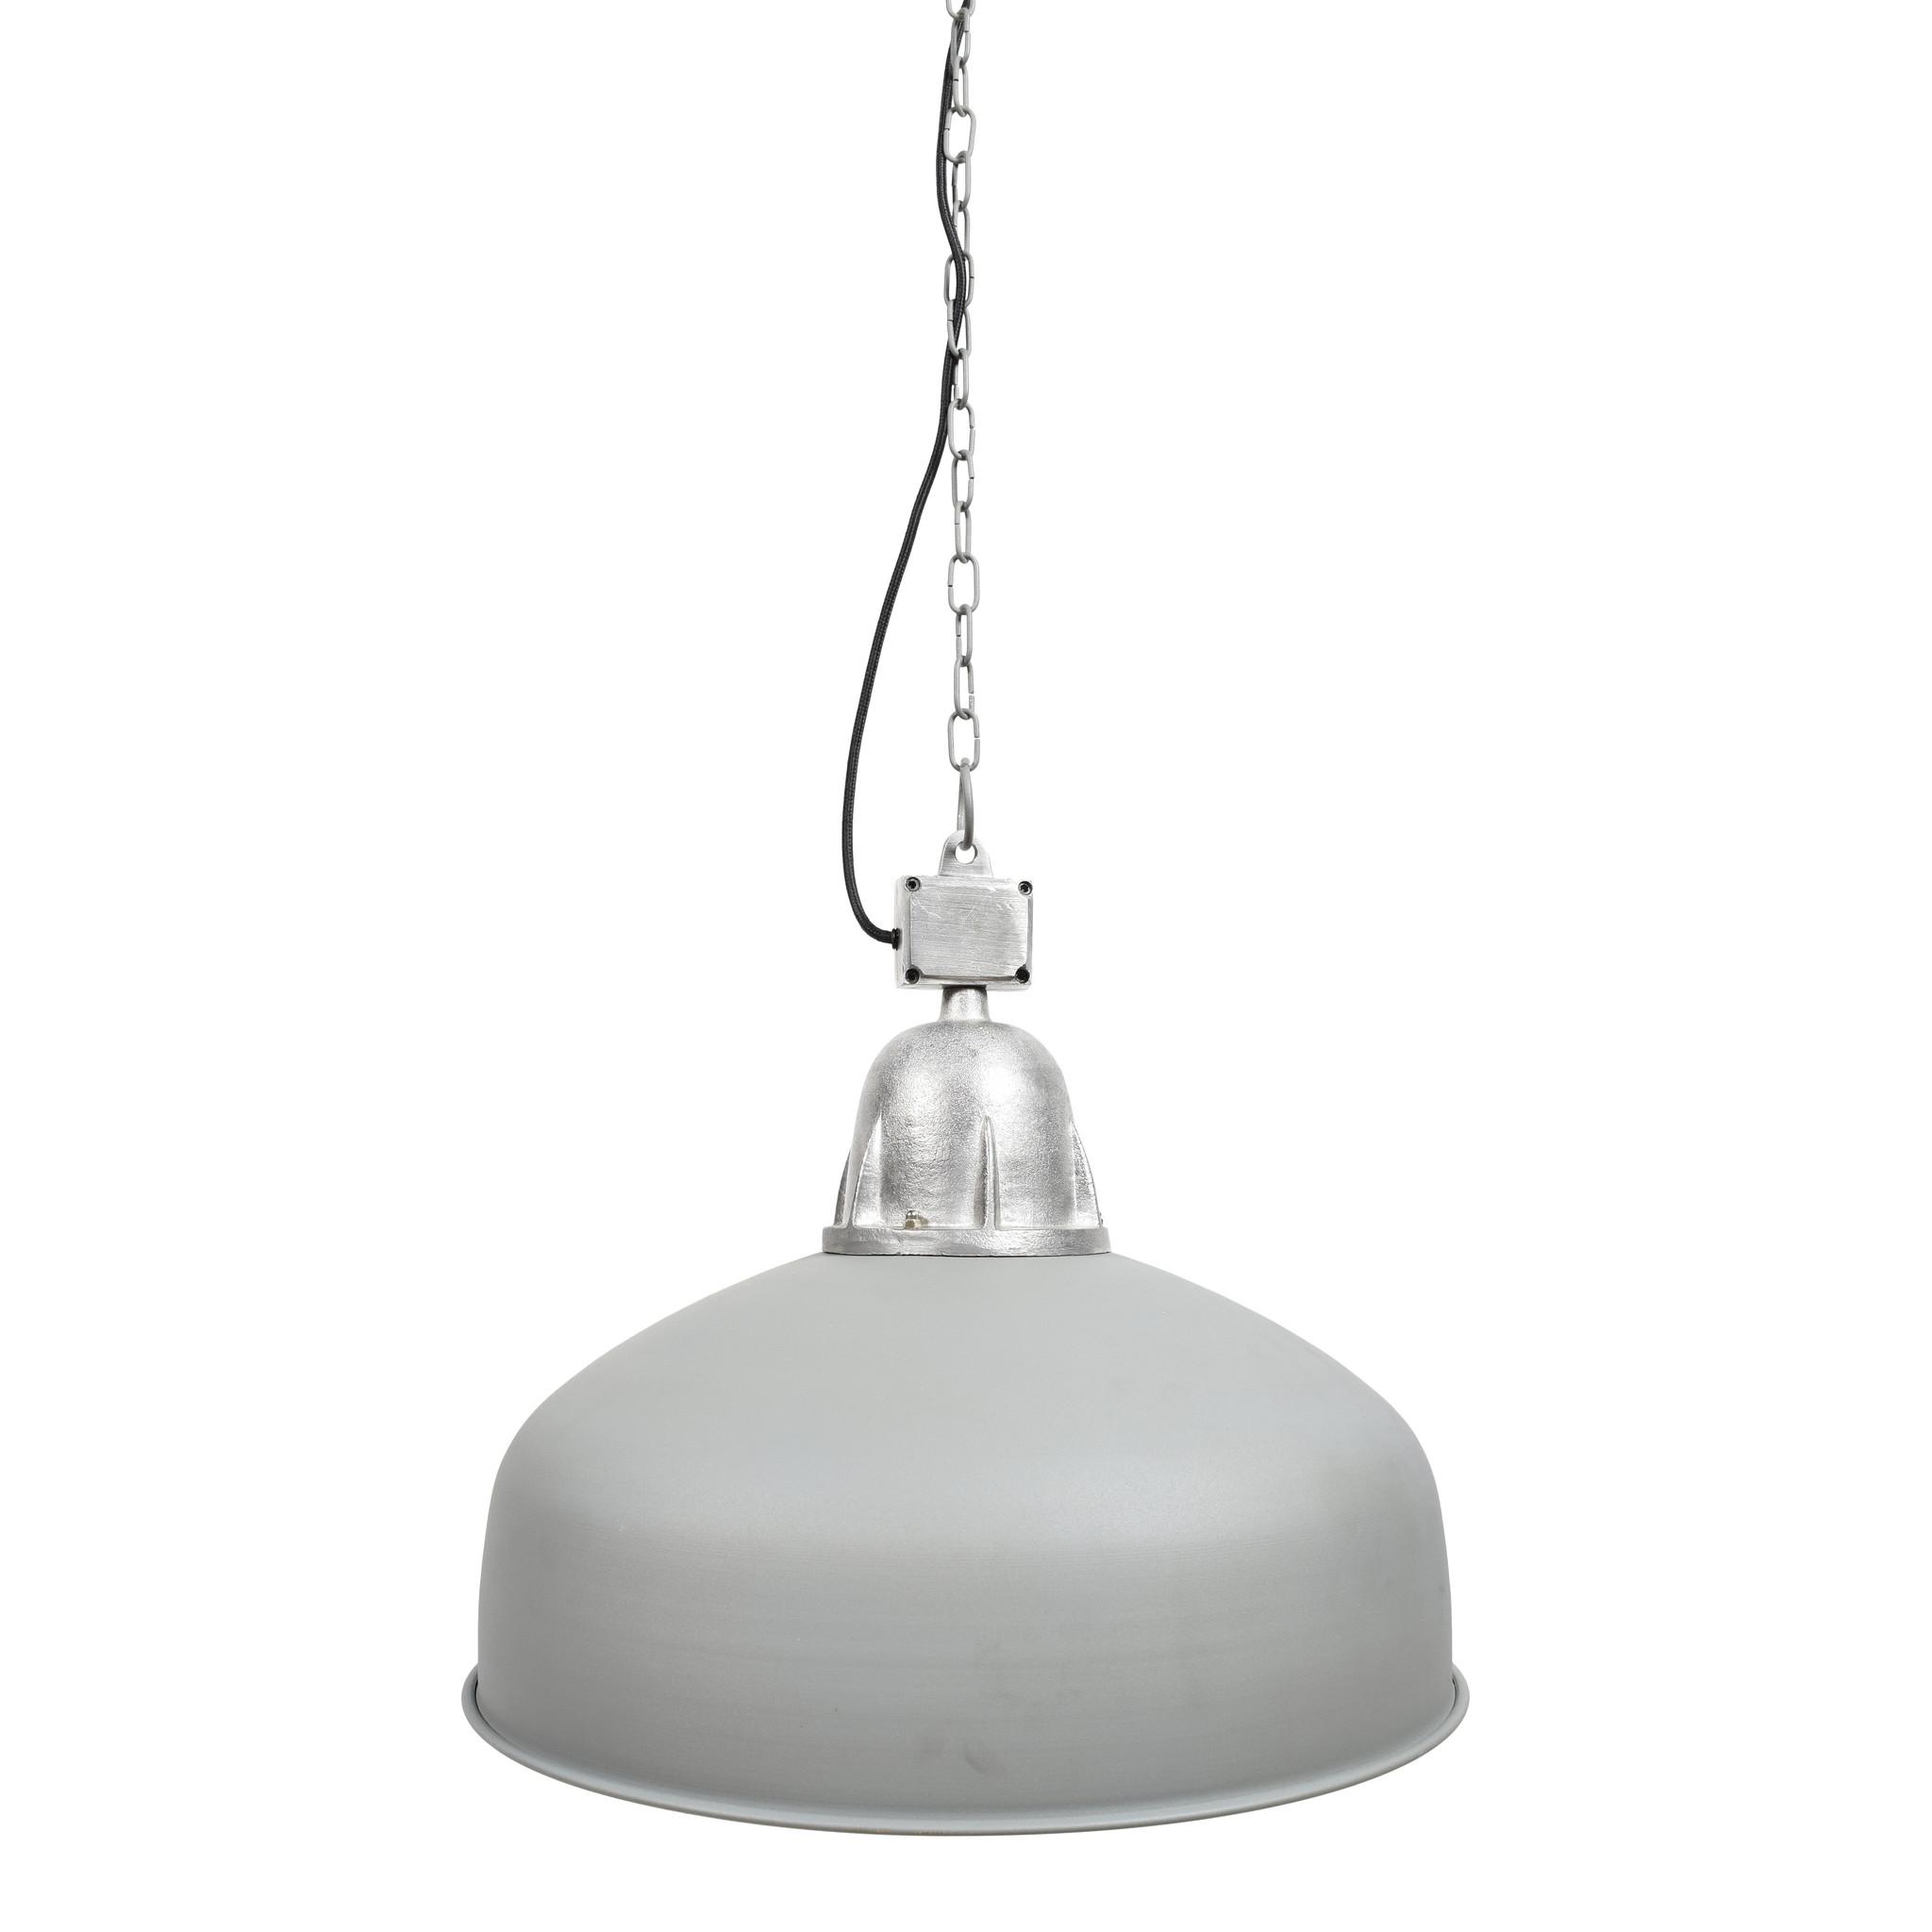 Urban Interiors Urban Interiors Hanglamp industrial ø50cm. vintage grey